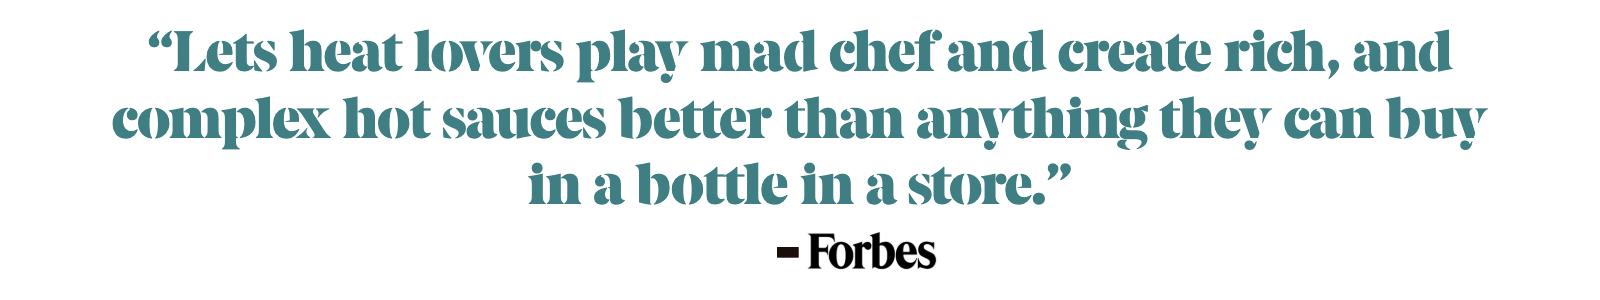 Forbes FSKHOT Quote (1).jpg